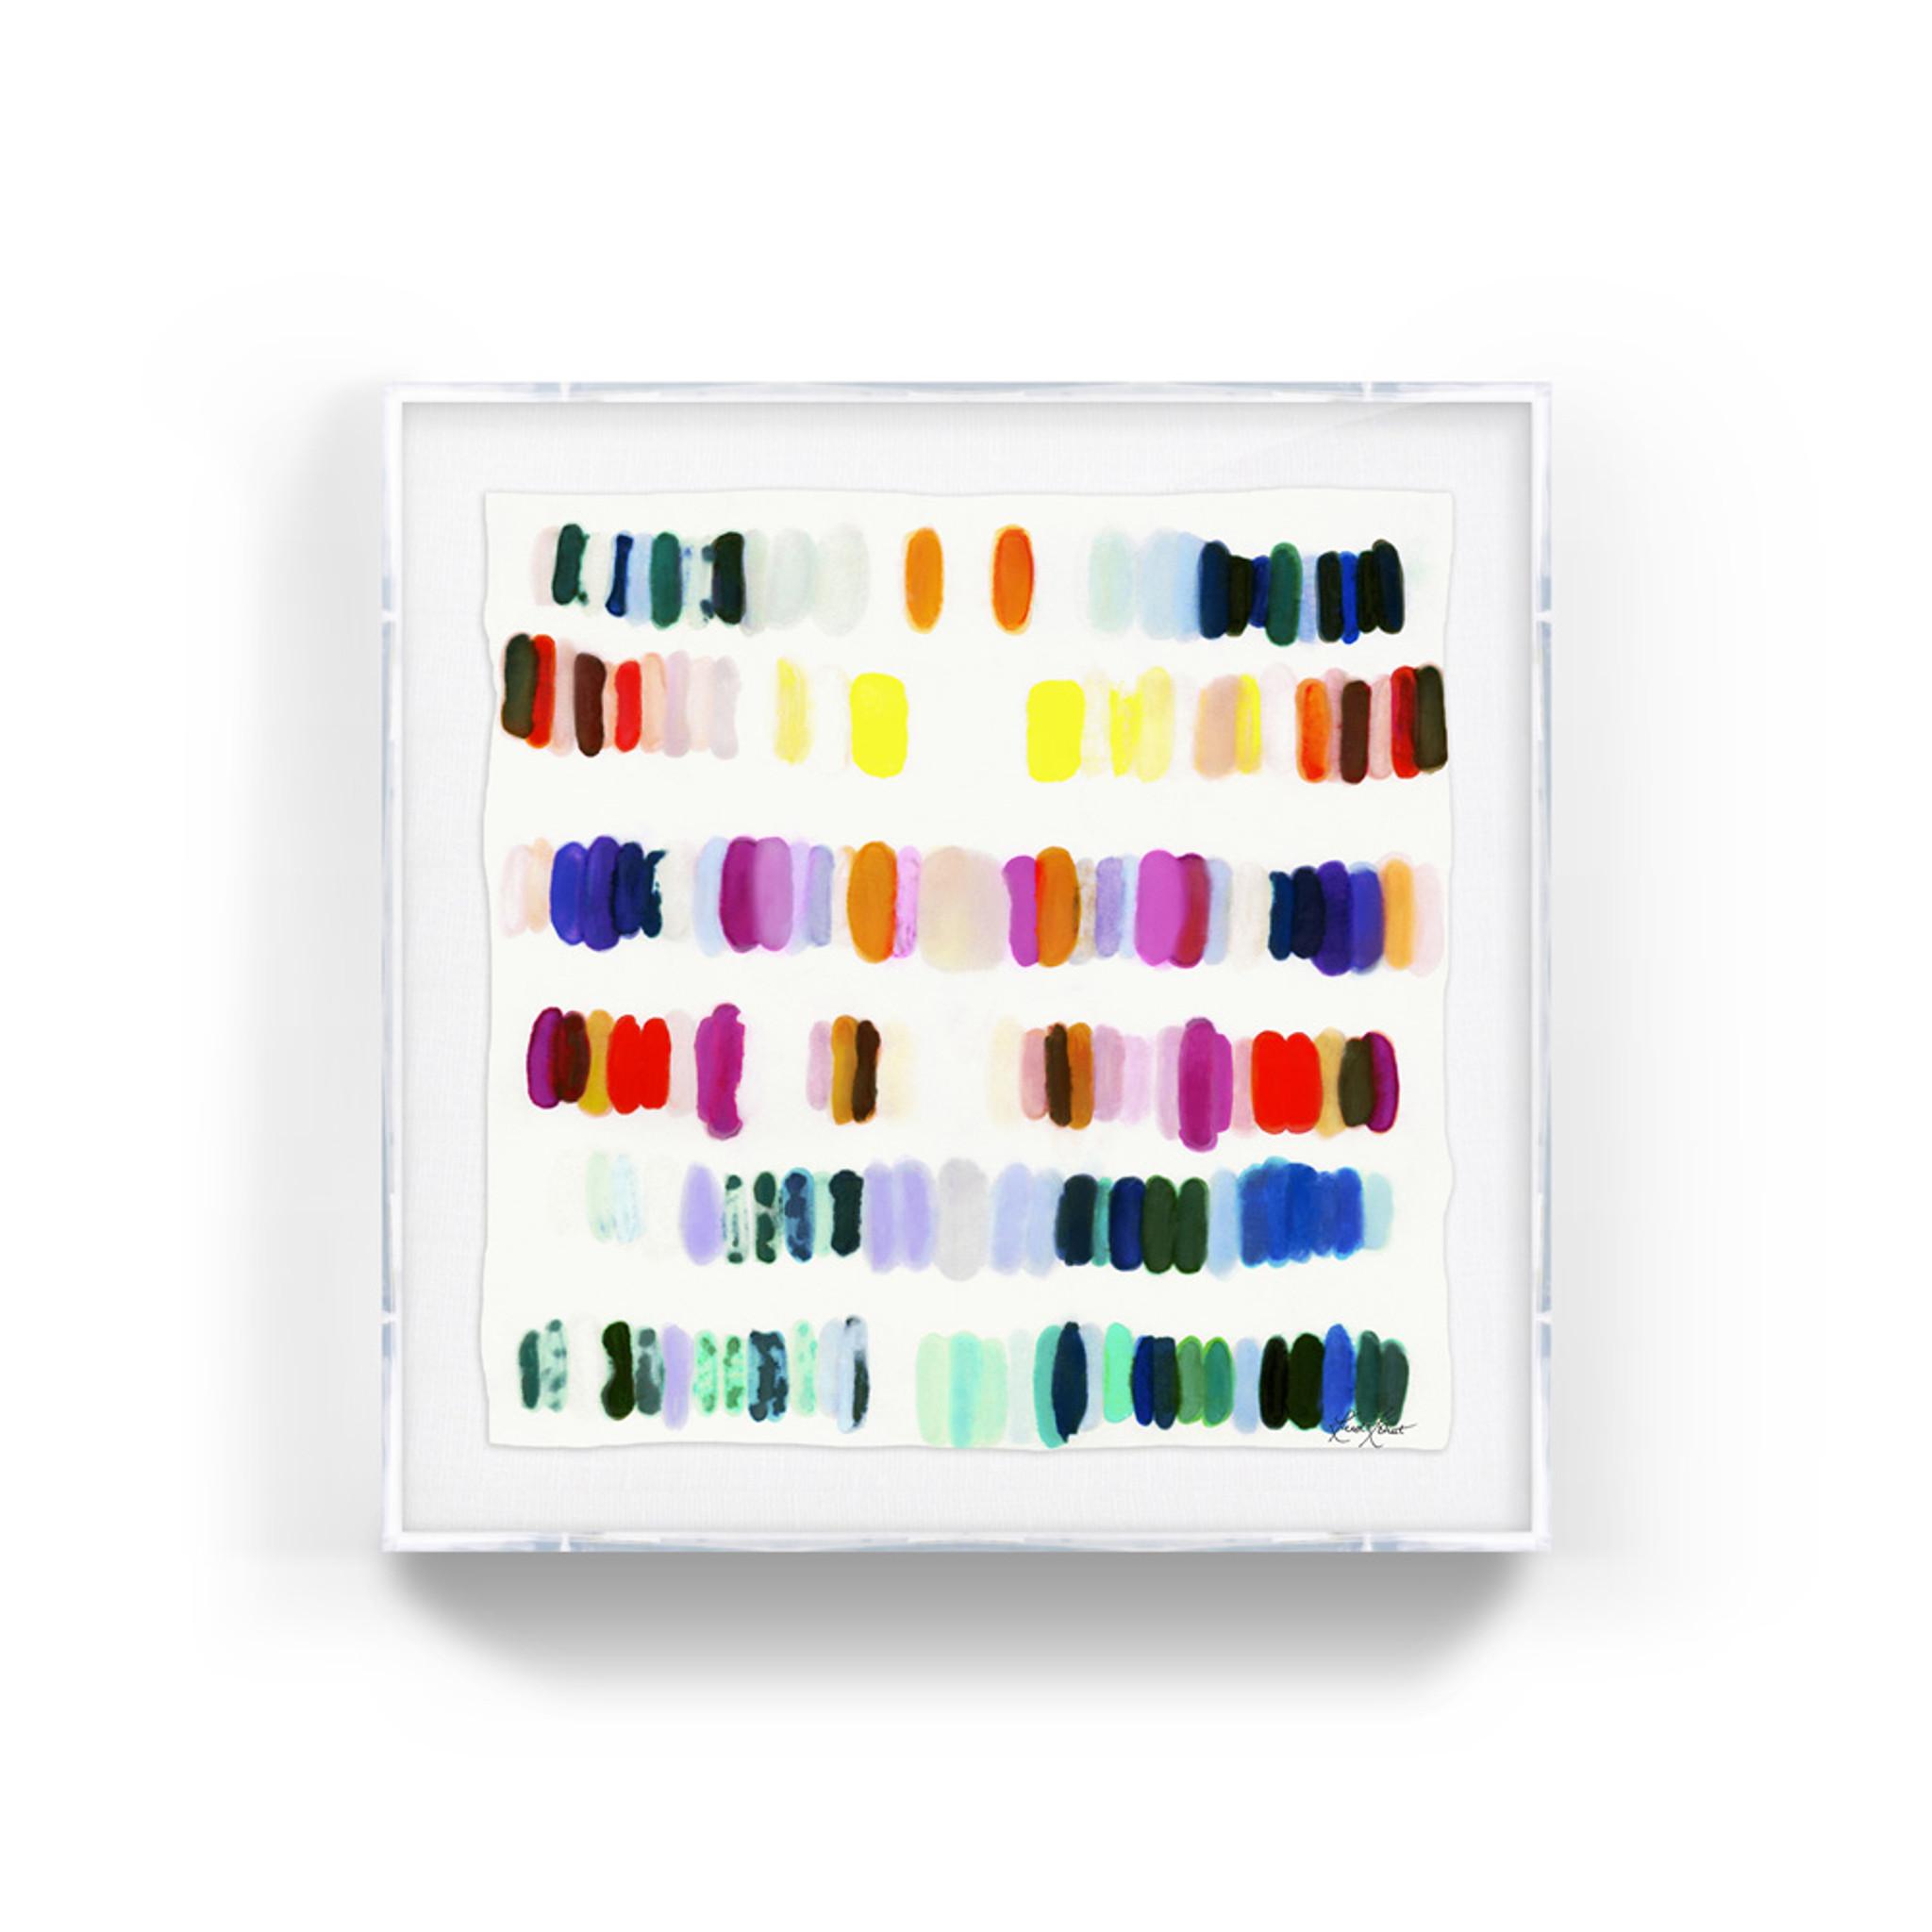 kristi kohut heavenly palette modern abstract fine art print lucite shadow box frame